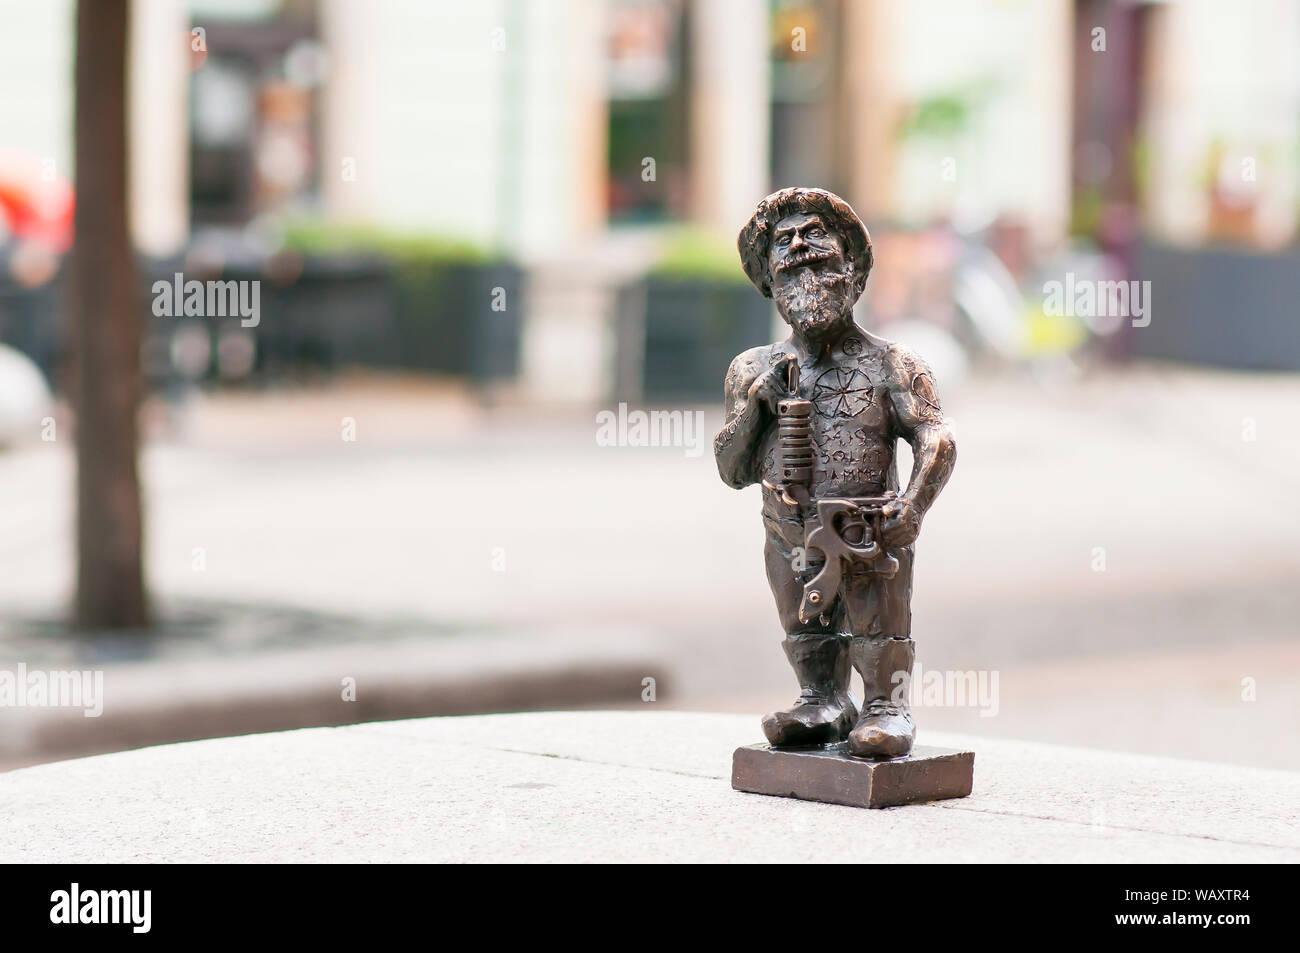 Wroclaw dwarf, gnome in Wroclaw main square. Poland Stock Photo